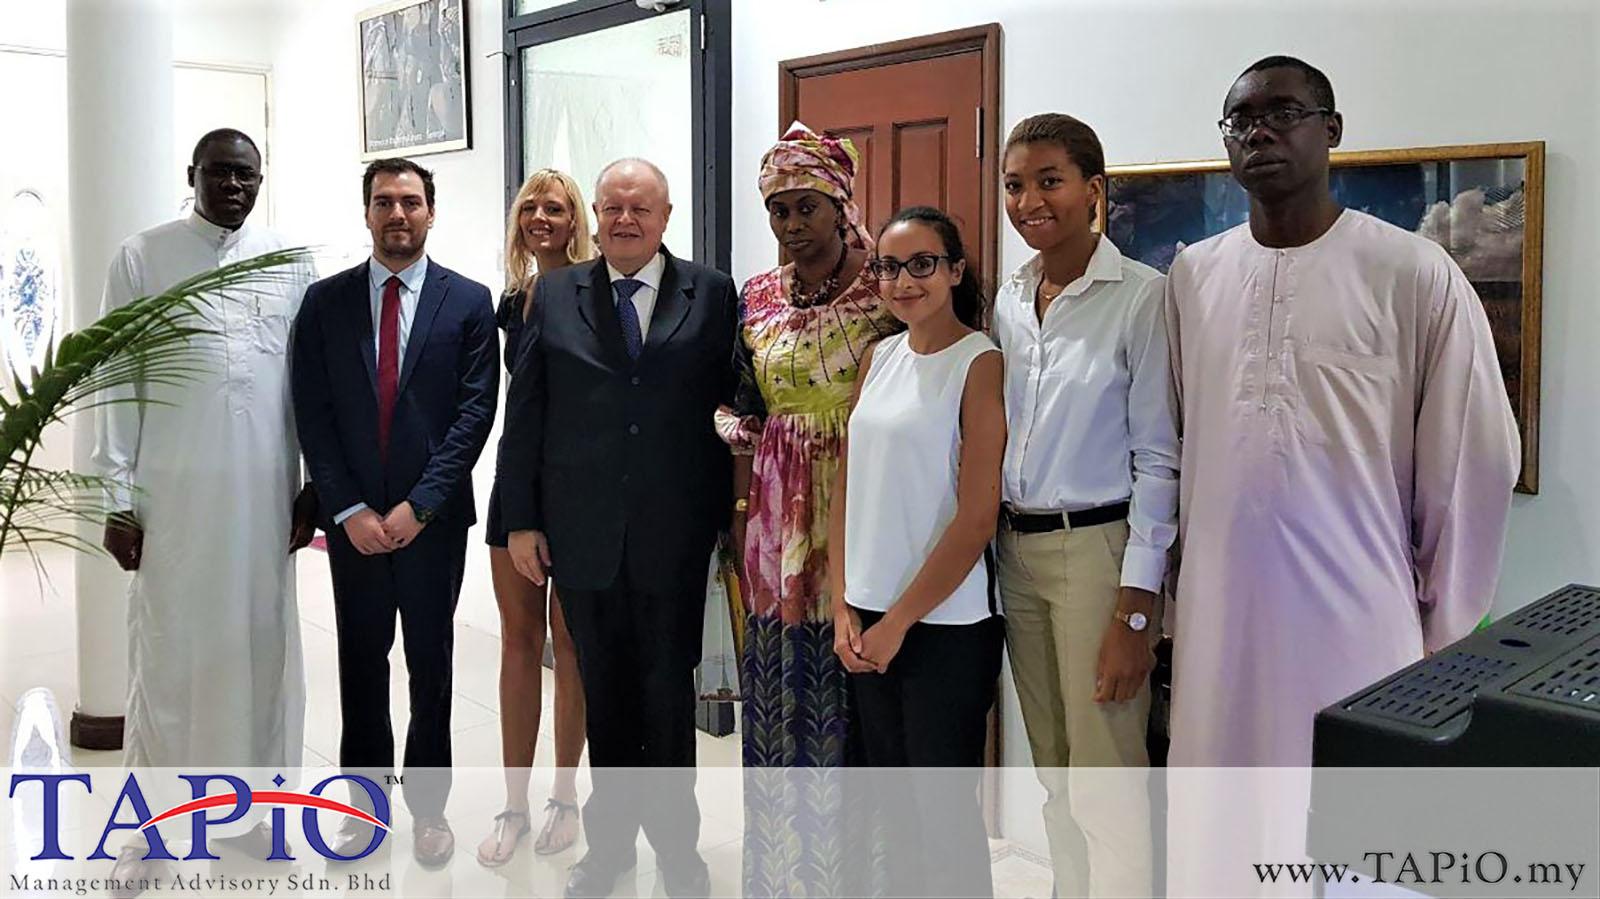 20190517 - Meeting With Ambassador of Senegal